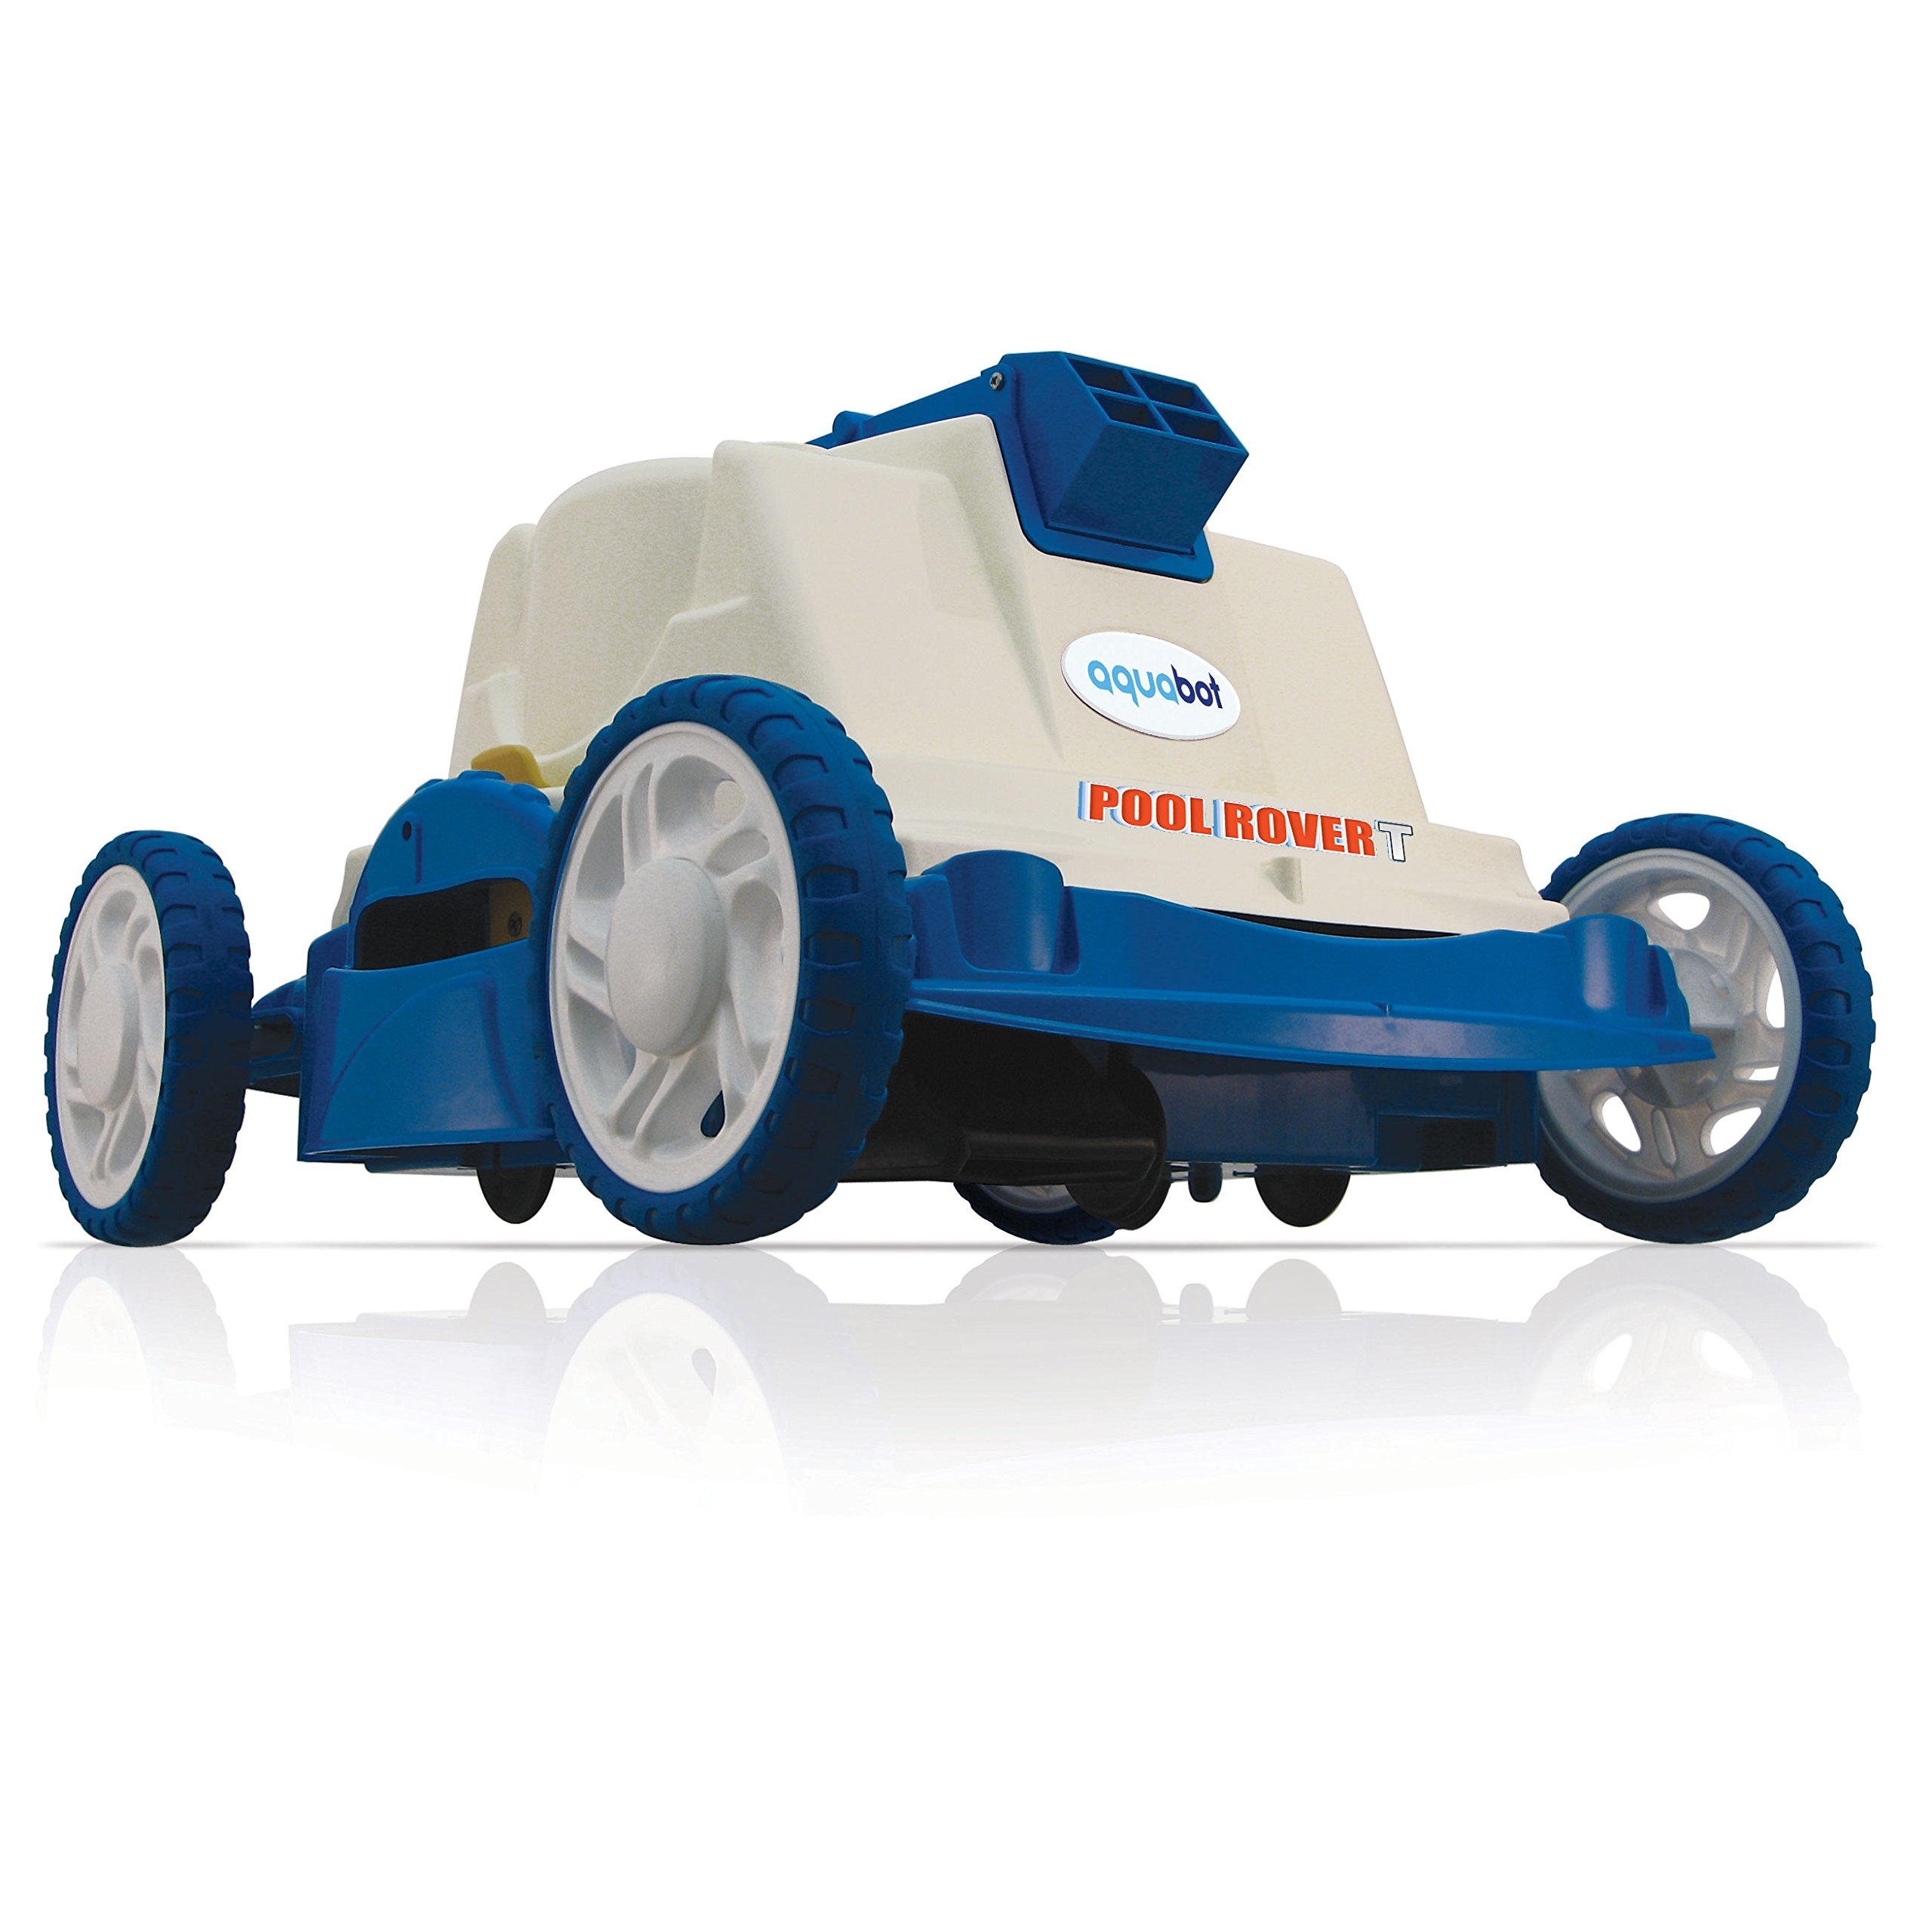 Aqua Products Pool Rover T Robotic Pool Cleaner by Aqua Products